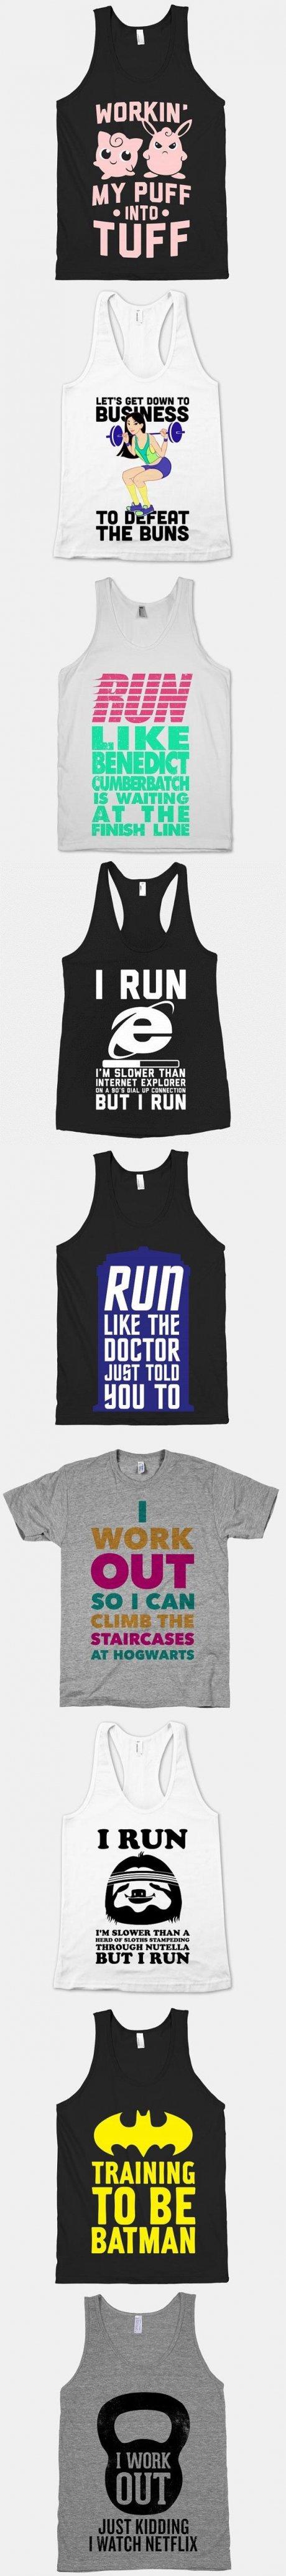 If Gym Clothes Were Honest.. funny ass shirts.. ELOHEL THAN u U ENE END RUN LIKE THE MISTER HUN TI] I RUN ETTA urn: nutn Matt, LA BUT! RUN TRAINING TO BE BATMAN